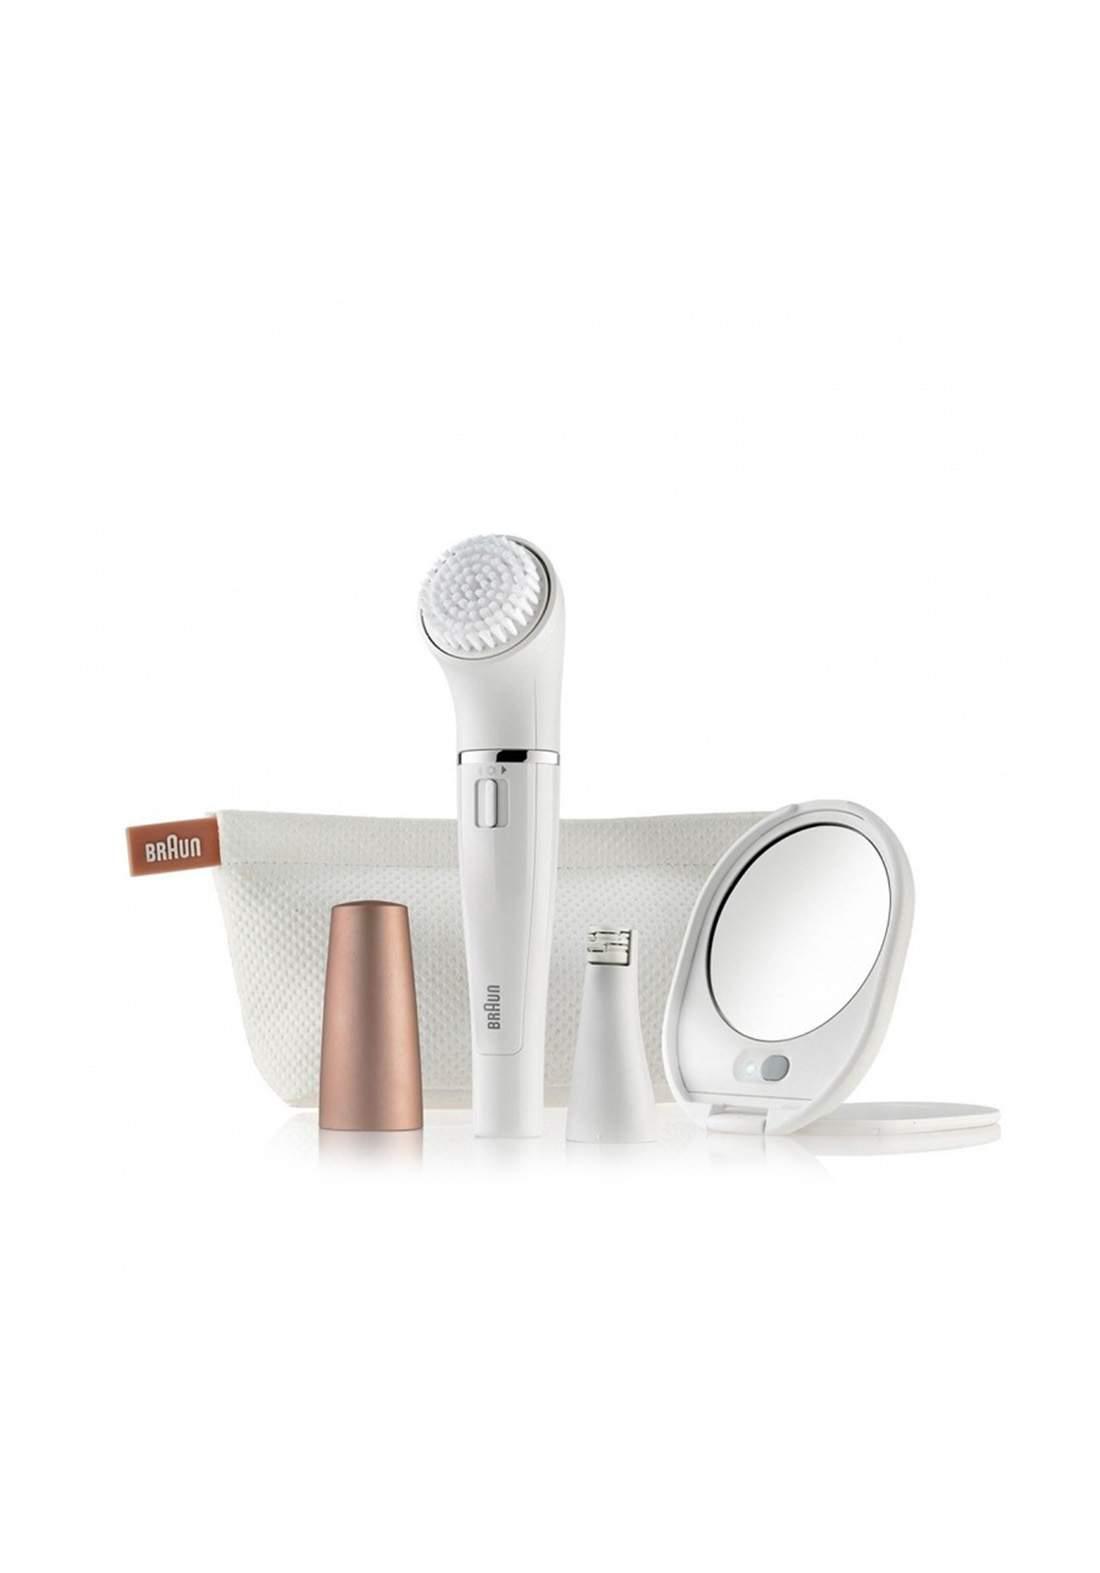 Braun 831 Beauty 831 facial cleansing brush and facial epilator  فرشاة تنظيف الوجه  وآلة إزالة الشعر